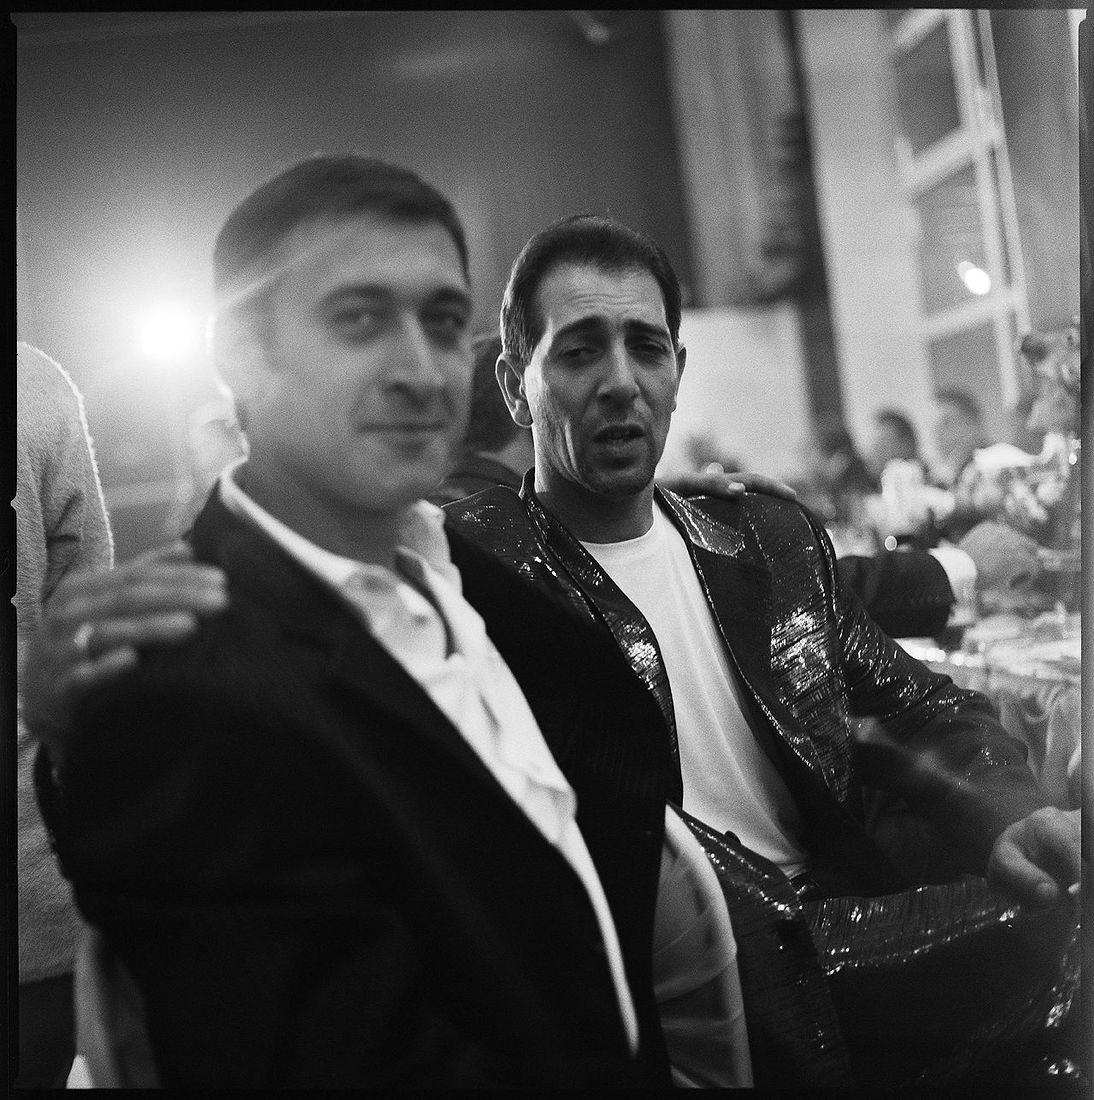 alpauk. Gypsies, wedding. 2007. sent13-09